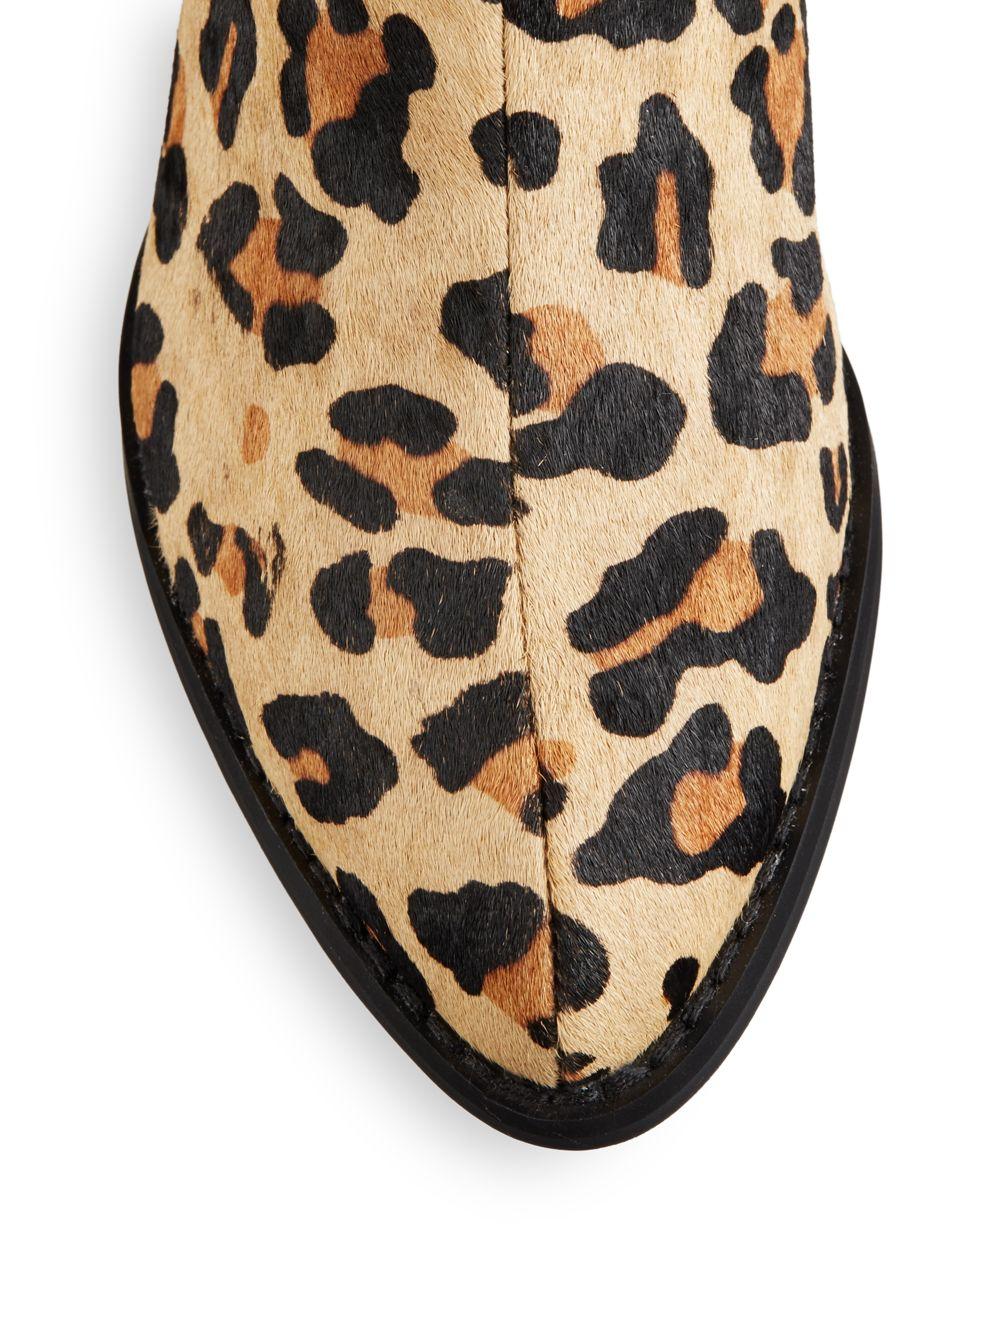 b3c83f948 Steve Madden Palace Leopard-Print Calf Hair Ankle Boots - Lyst